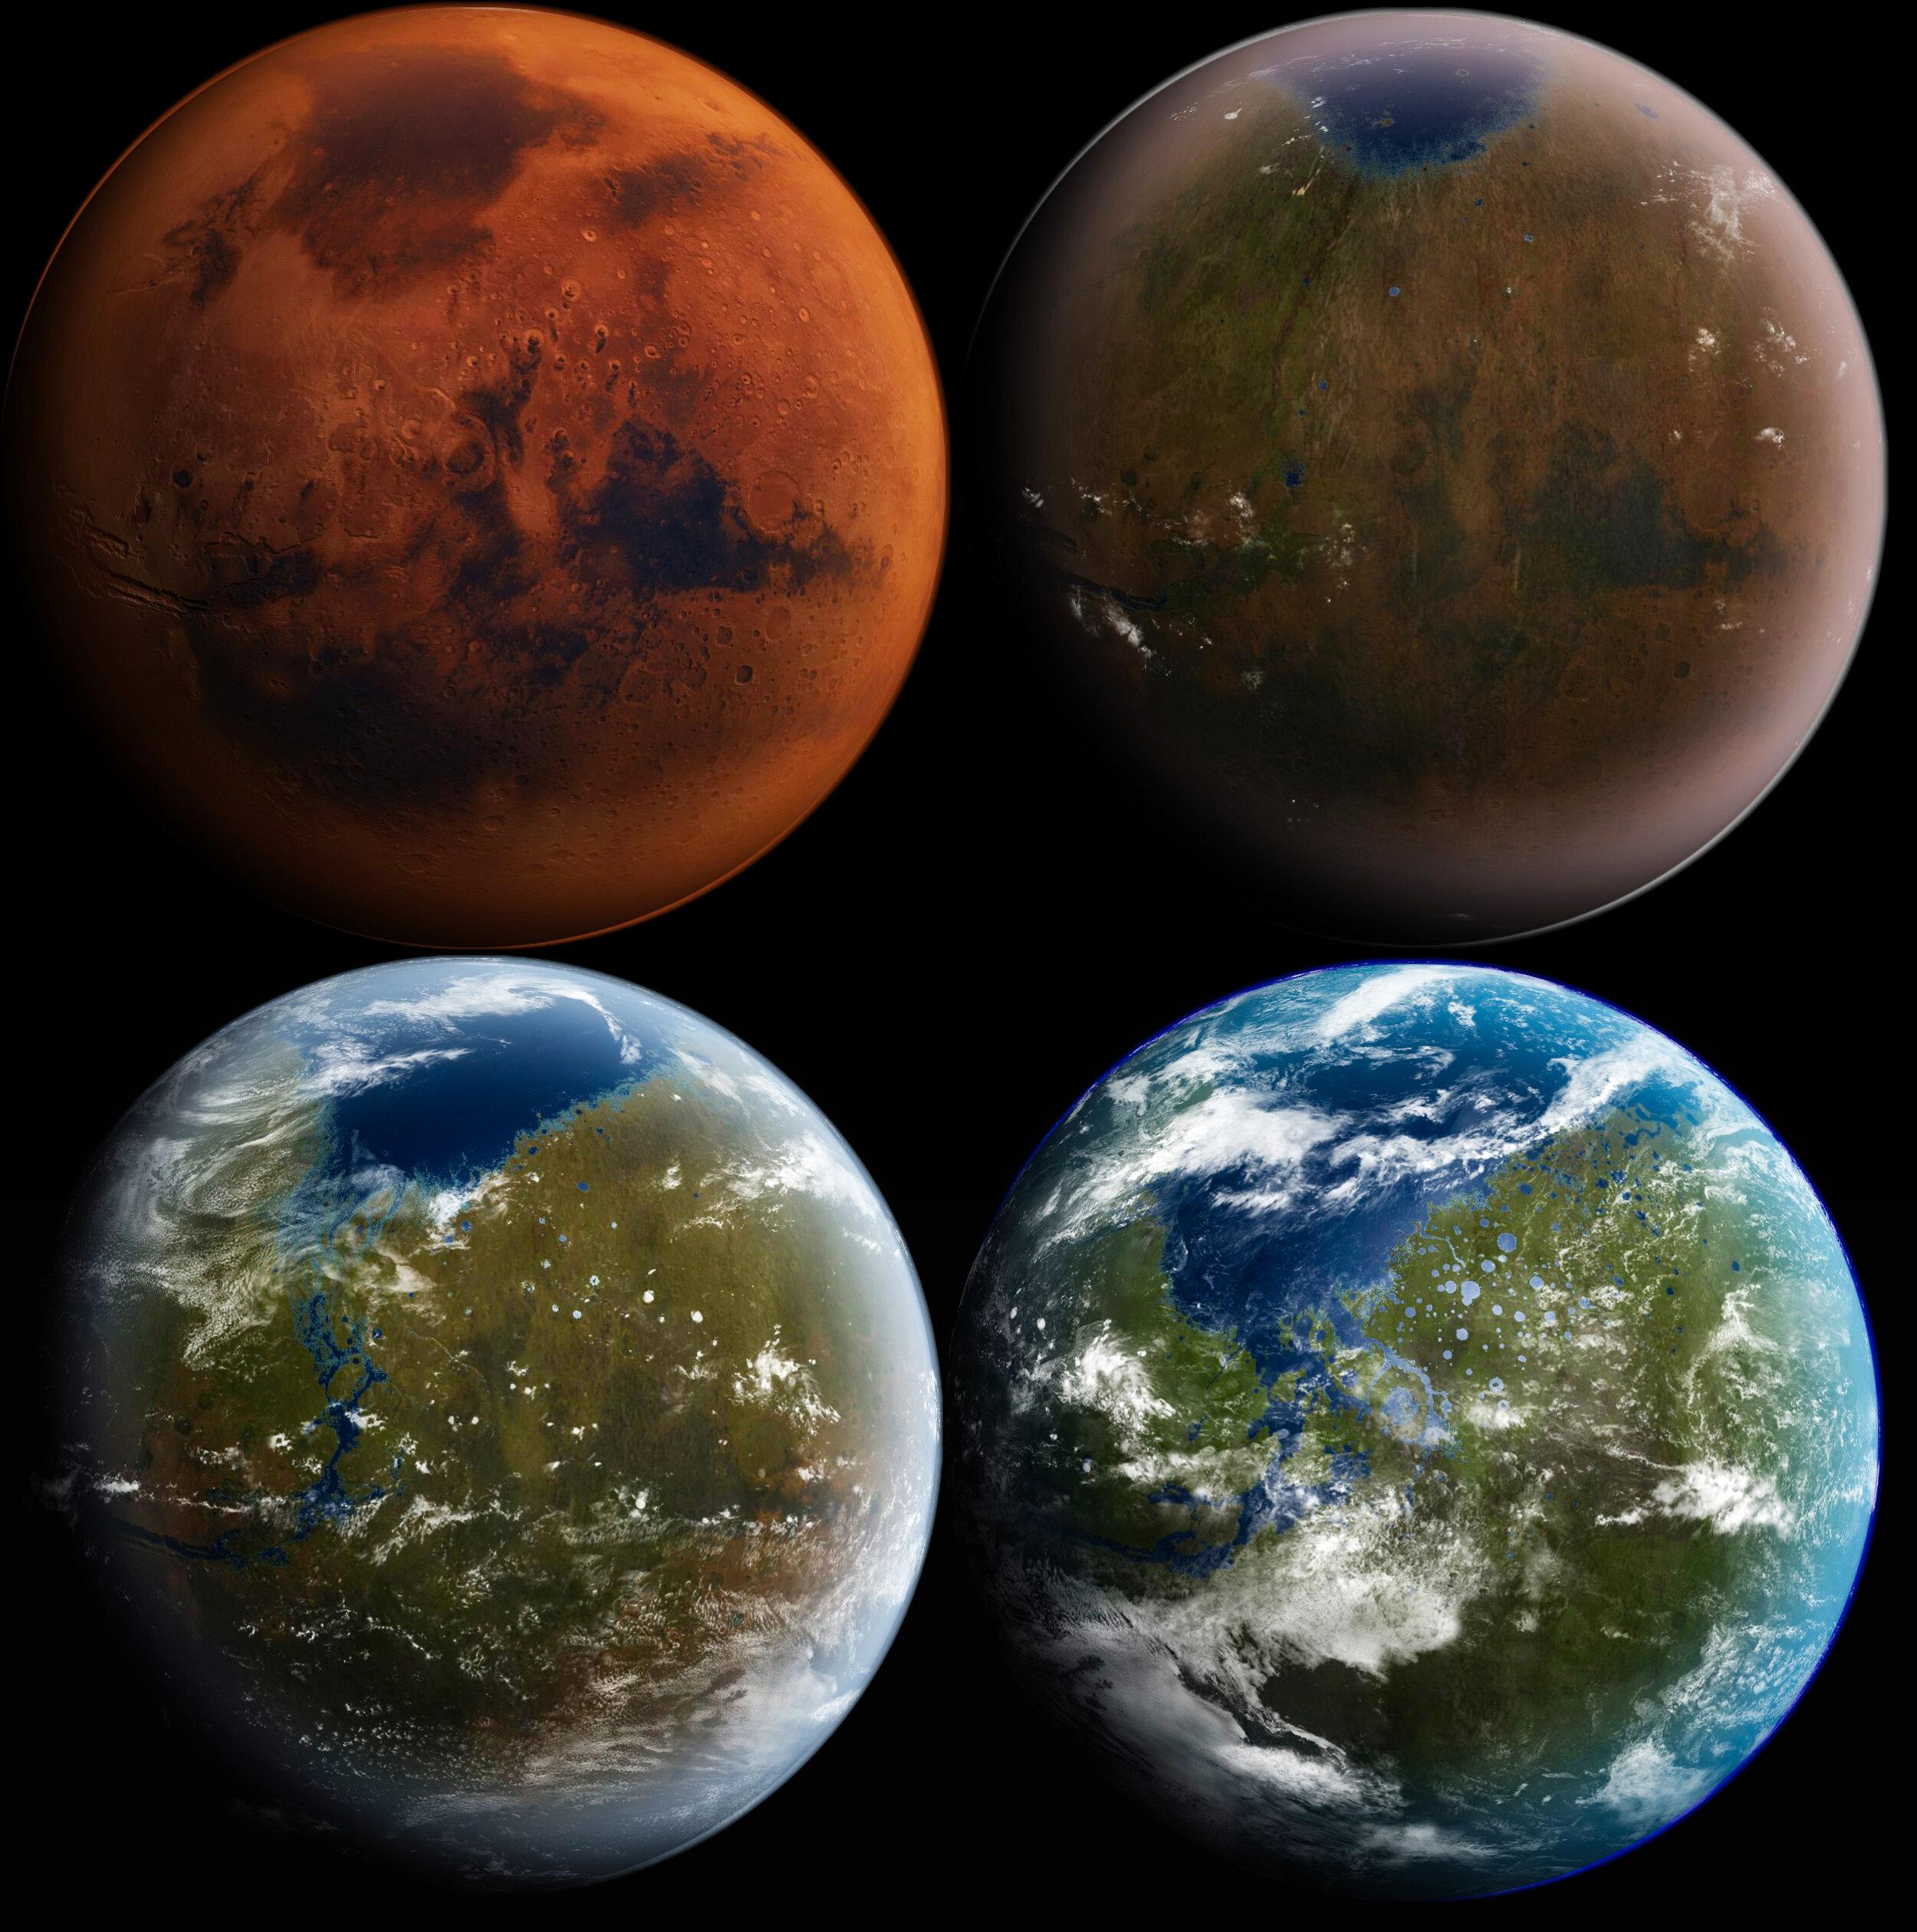 Image Credit:  Daein Ballard via Wikimedia Commons  - HDR tune by  Universal-Sci